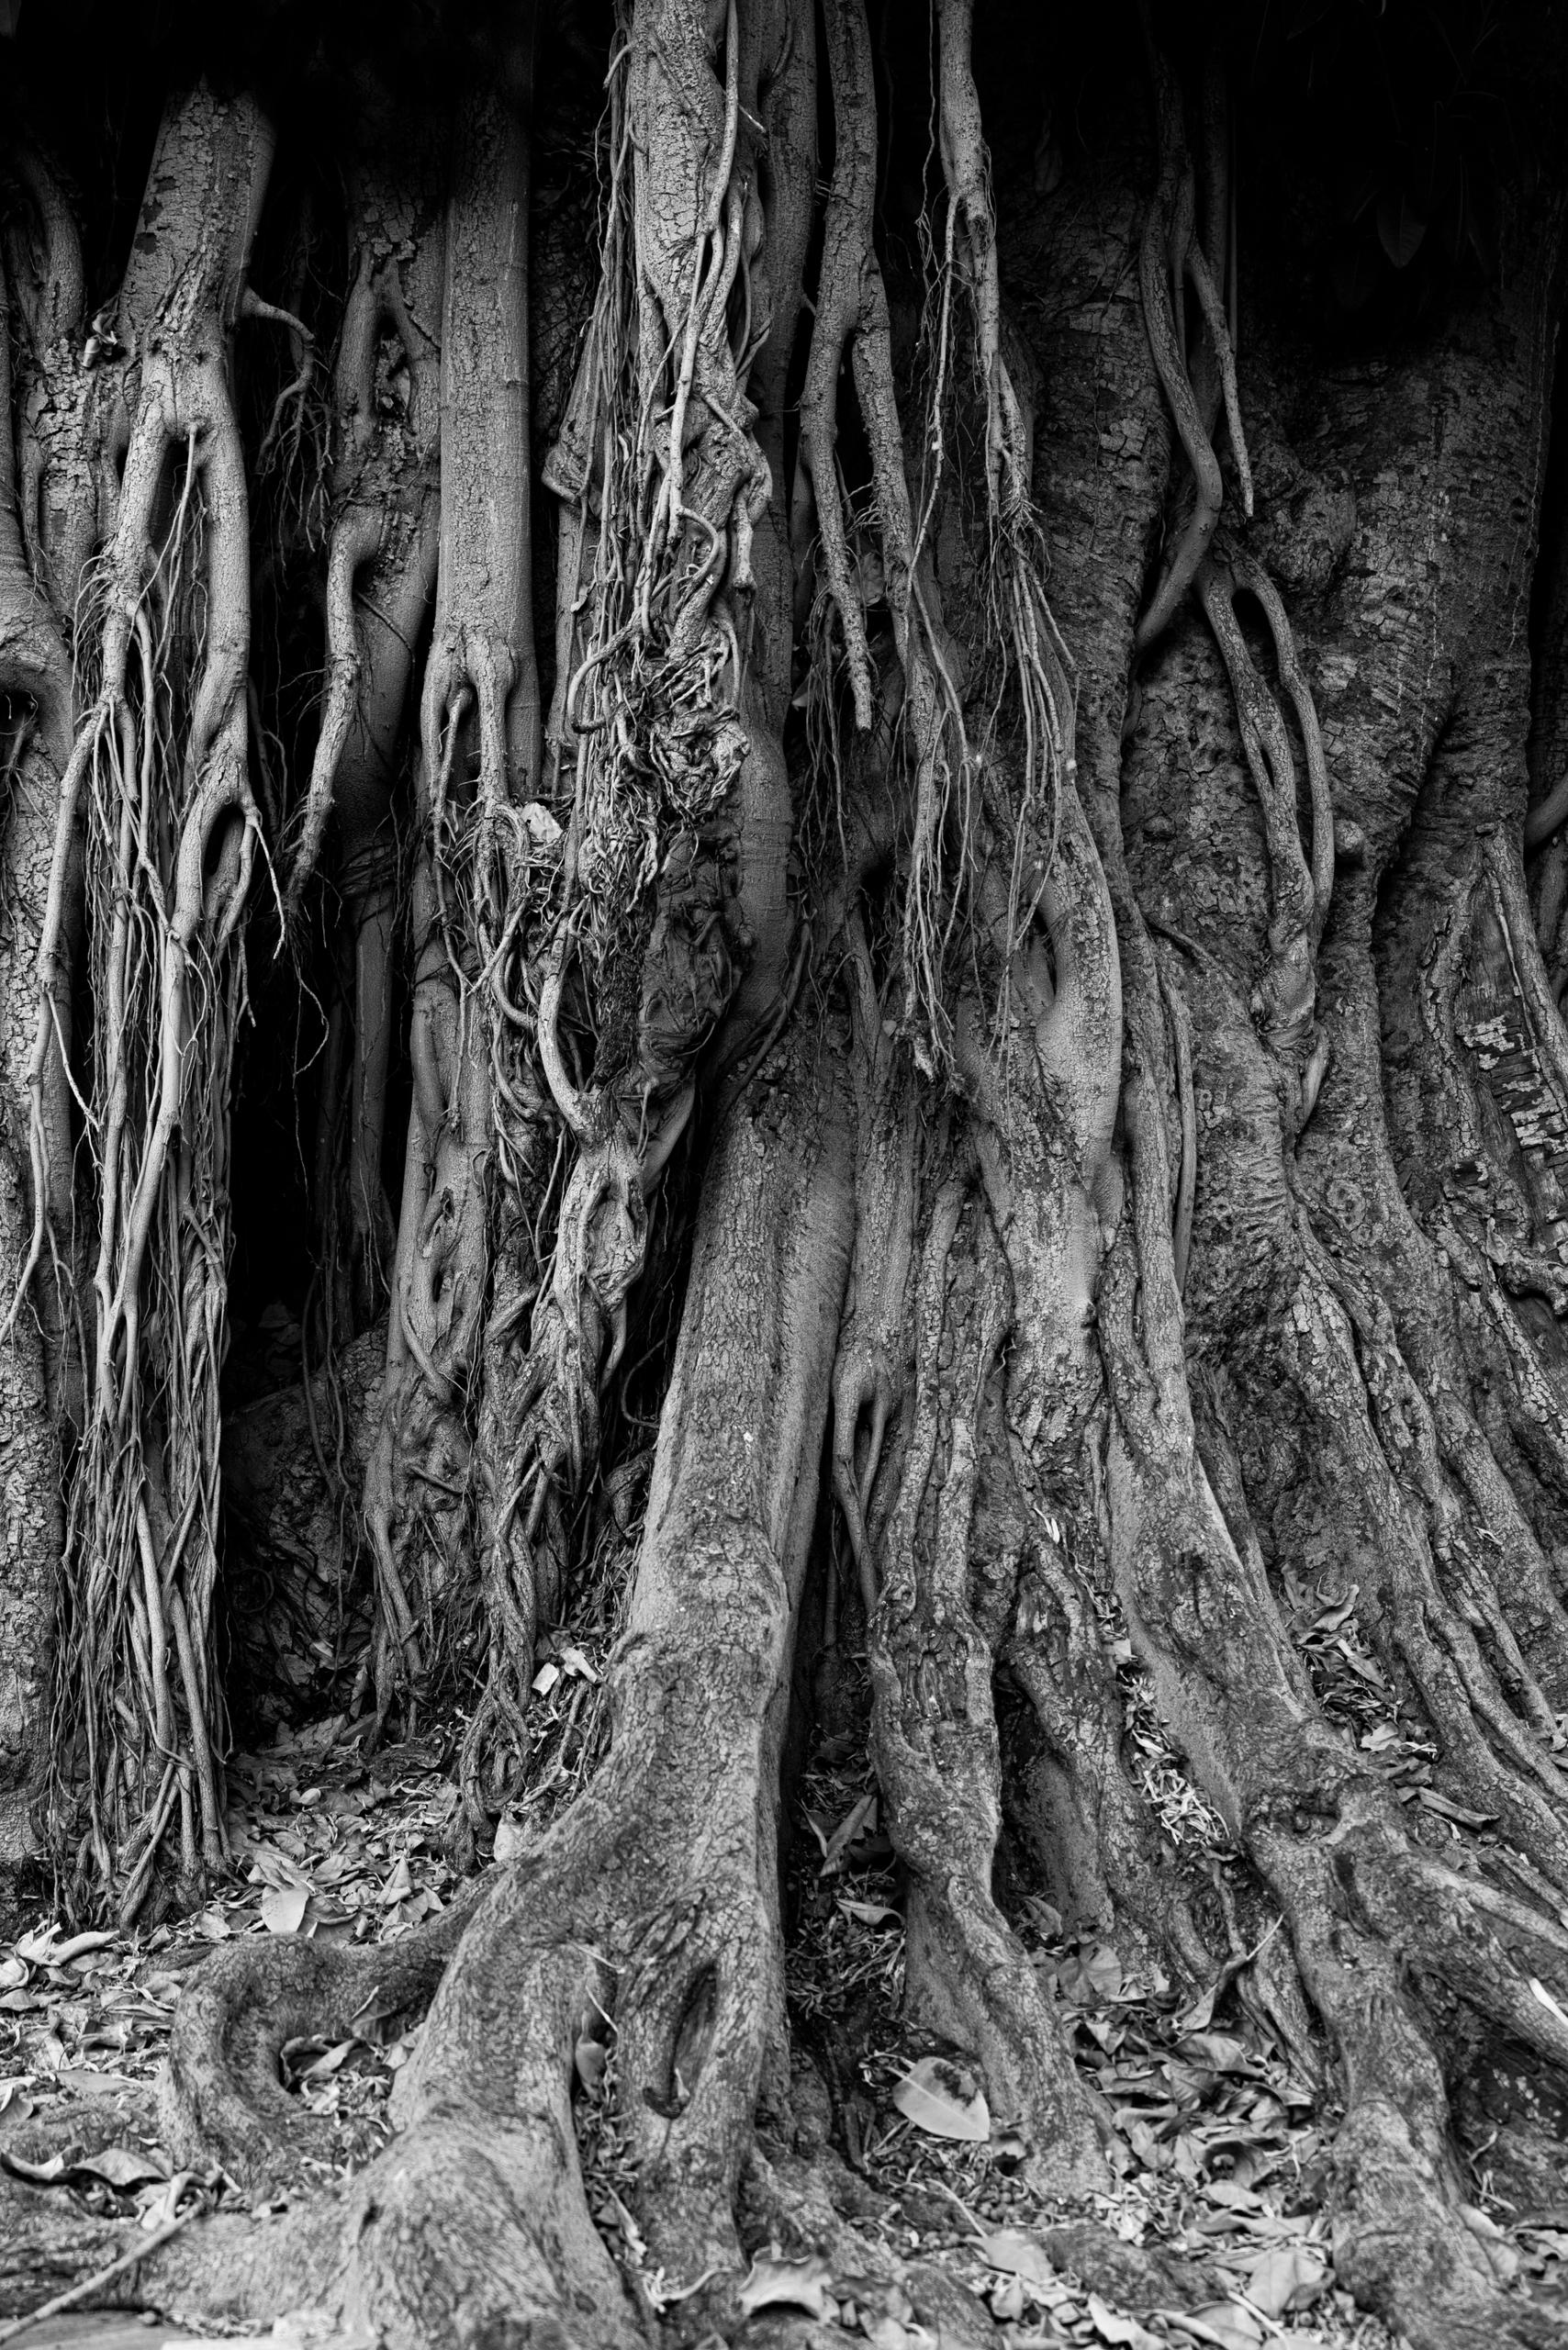 Spooky tree, Seville 205 9/2019 - notabene   ello